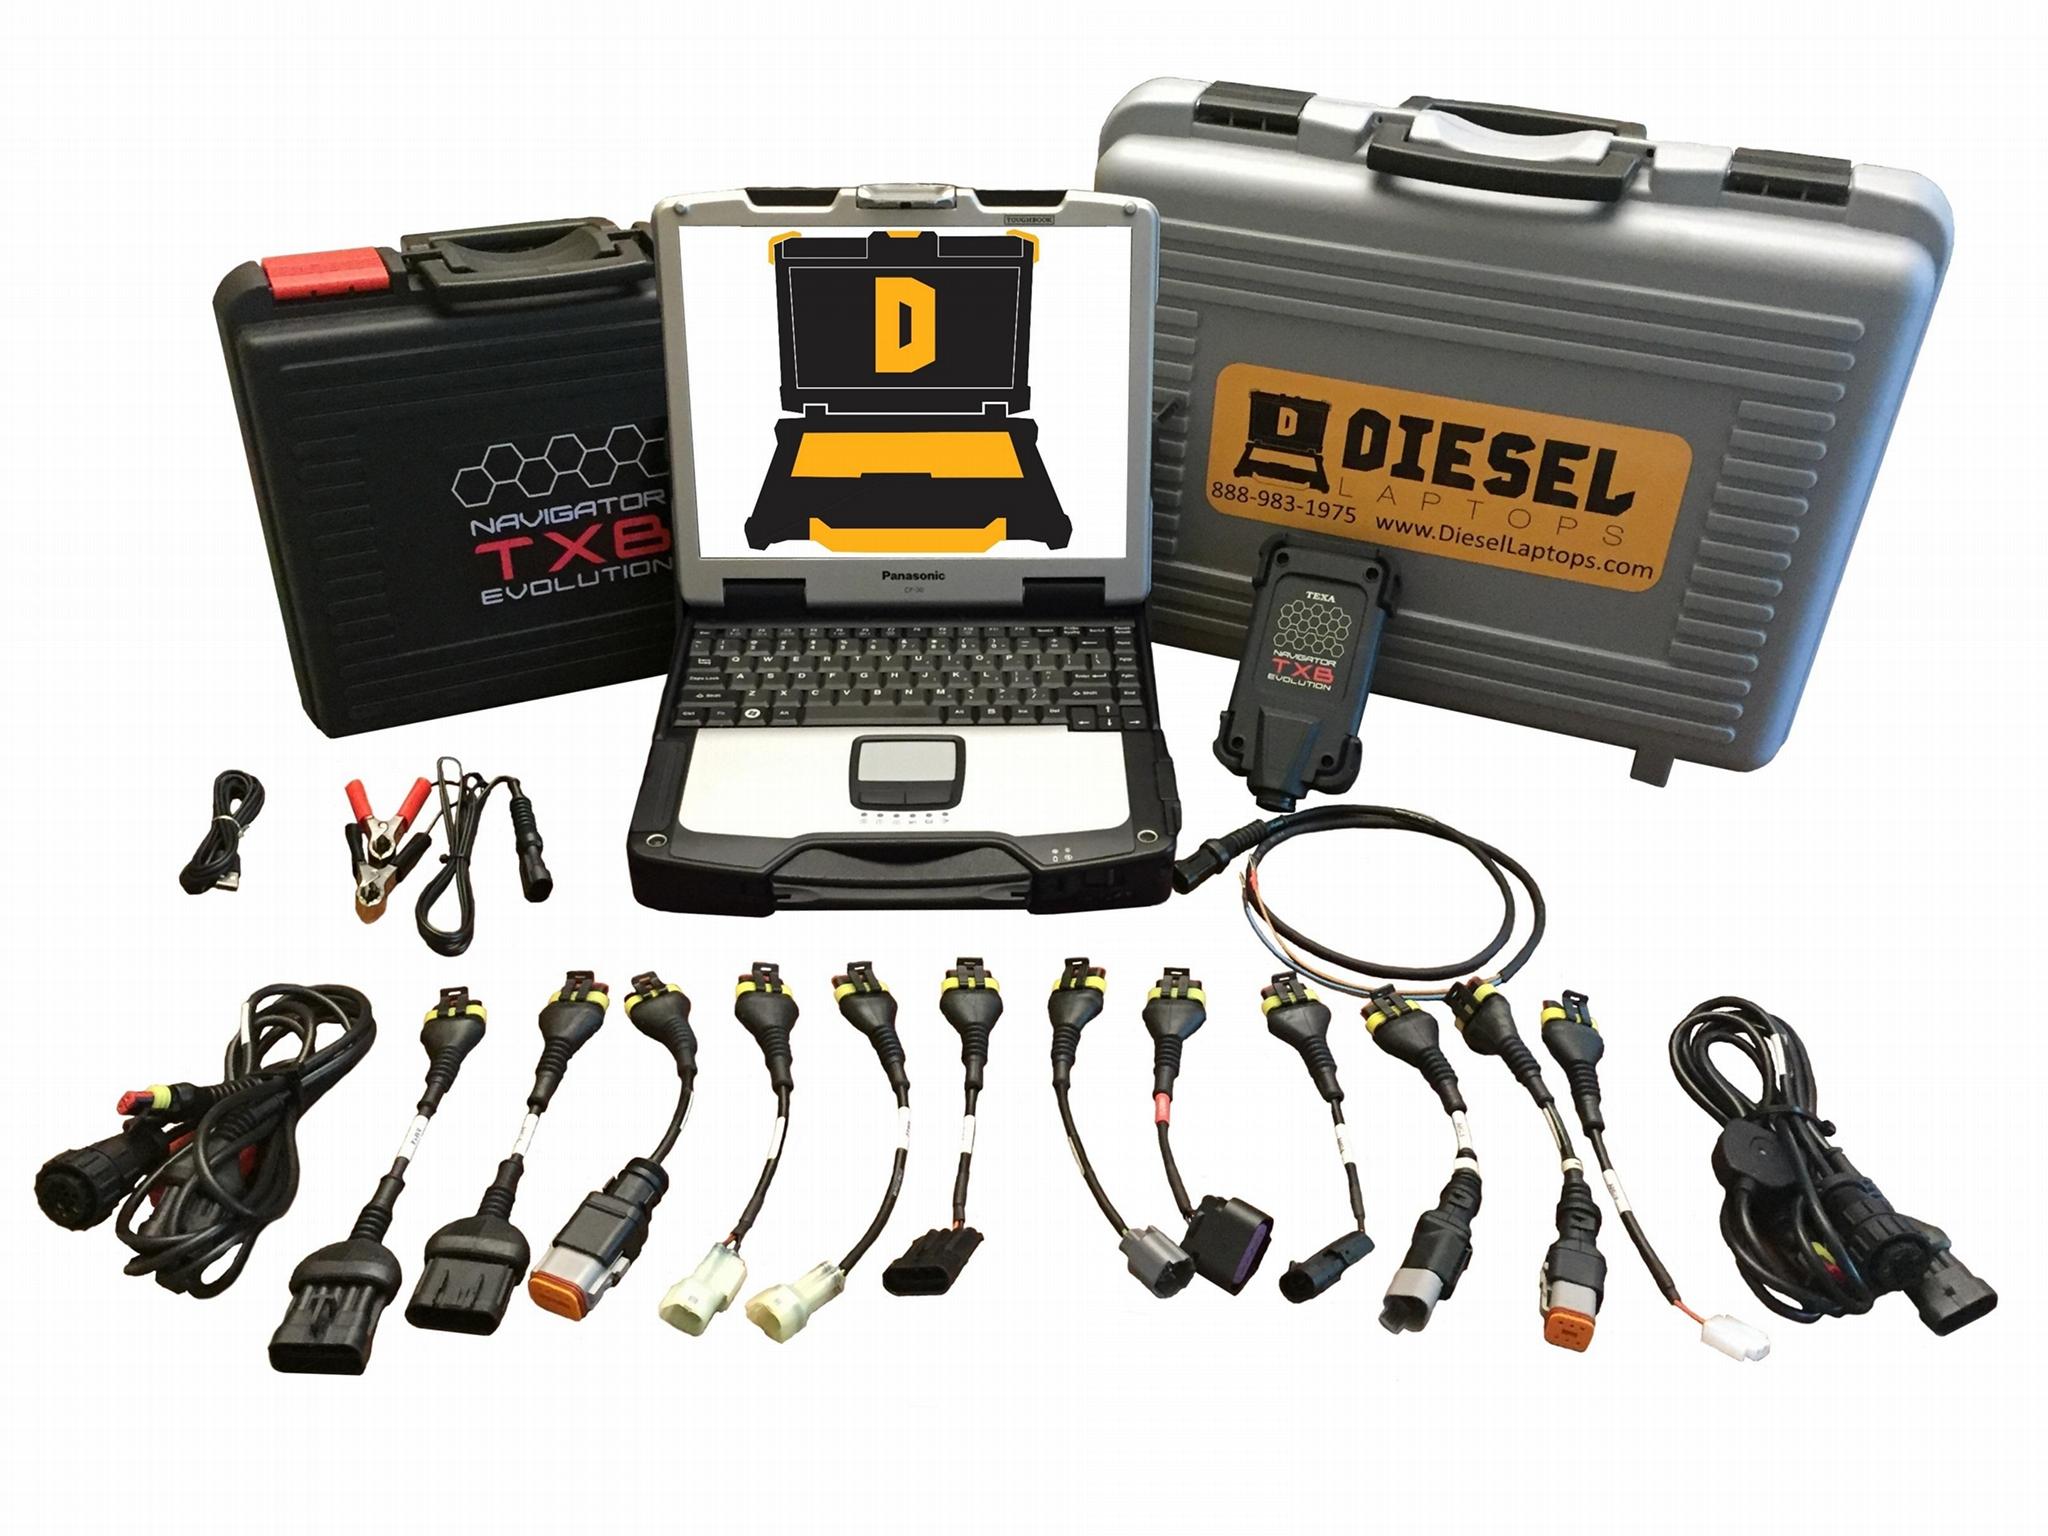 TEXA Dealer Level Marine Diagnostic Scanner Tool Basic Coverage